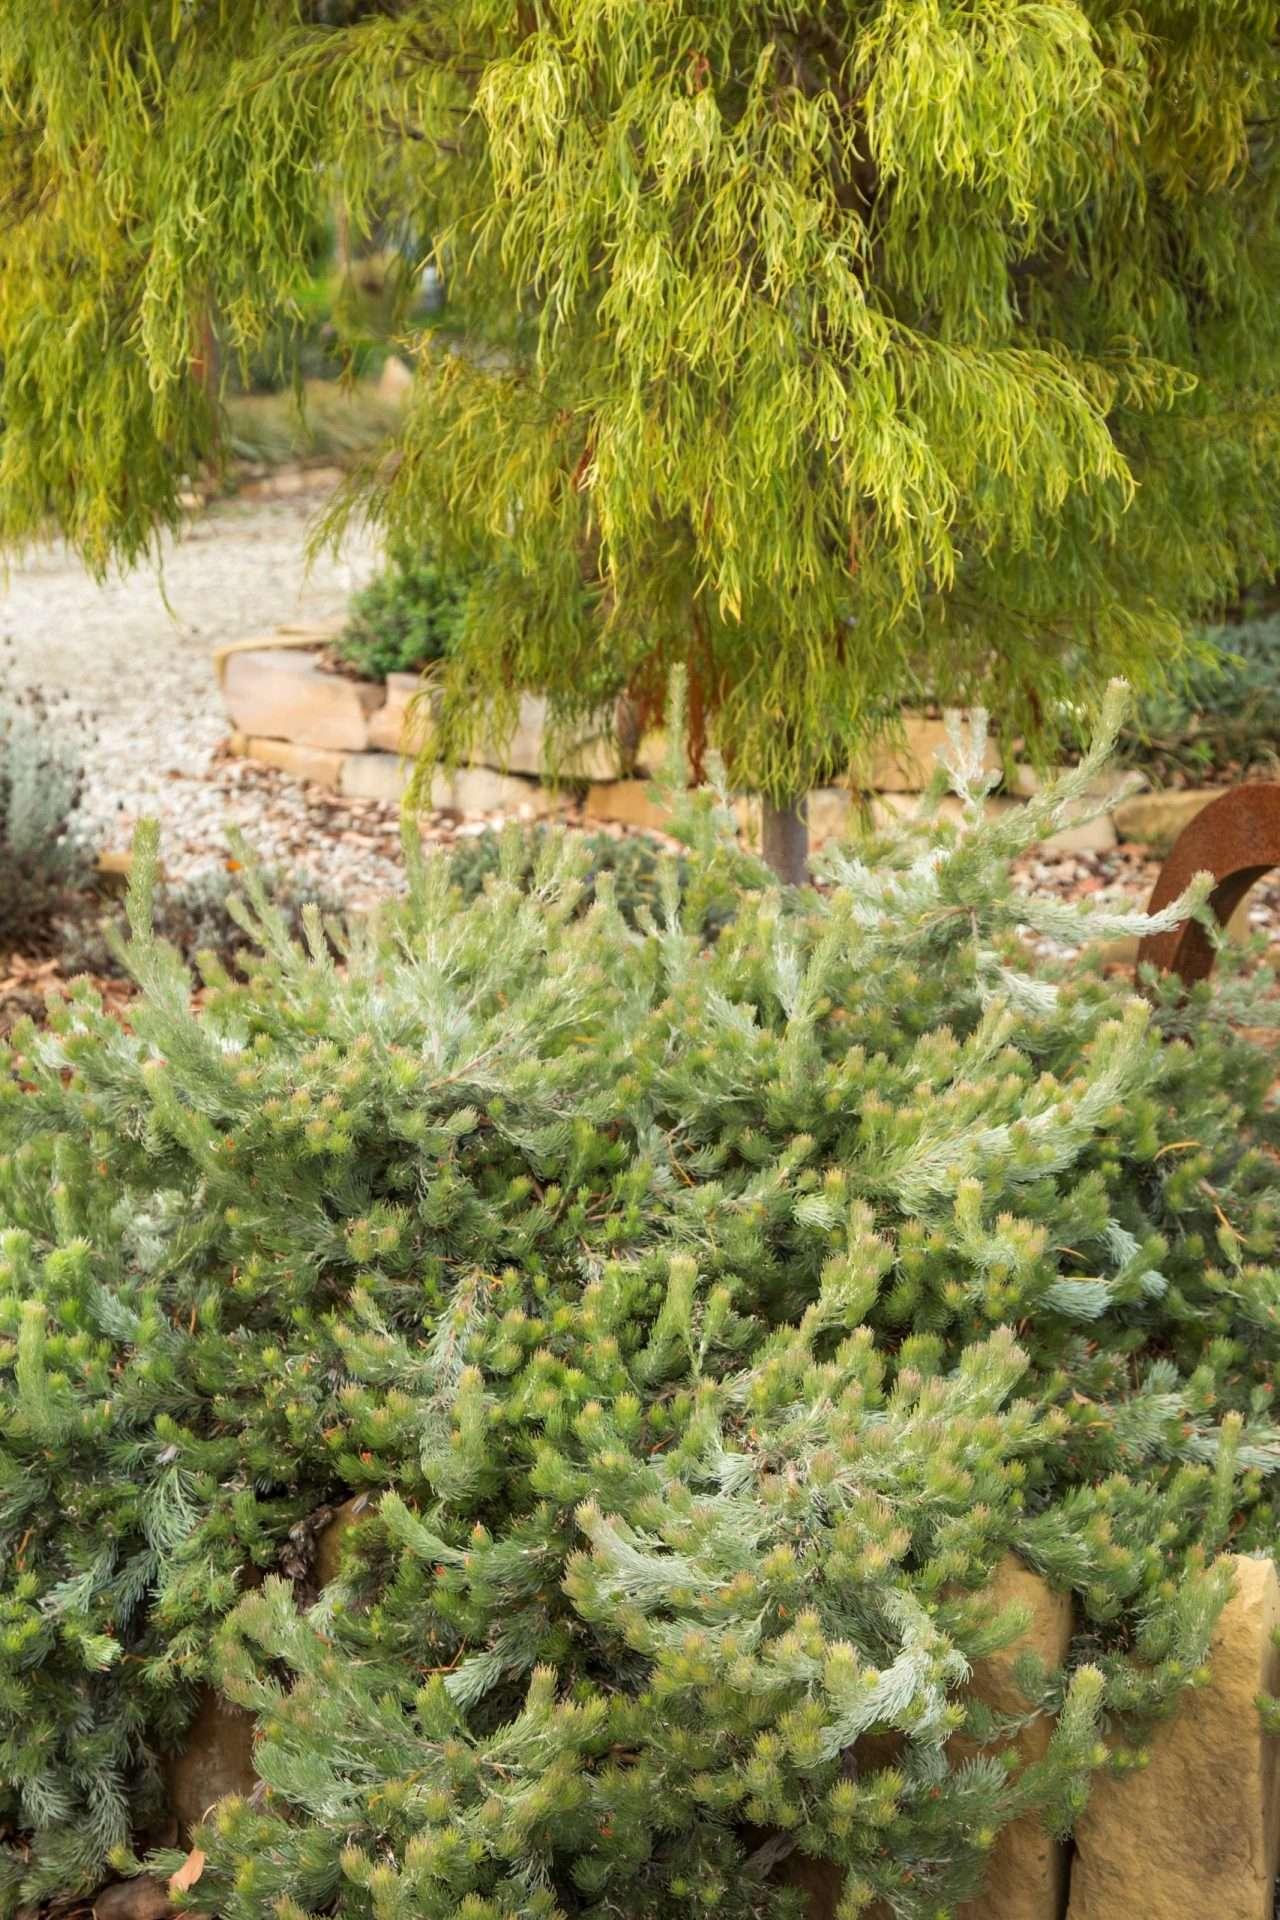 Adenanthos - Silver Lining